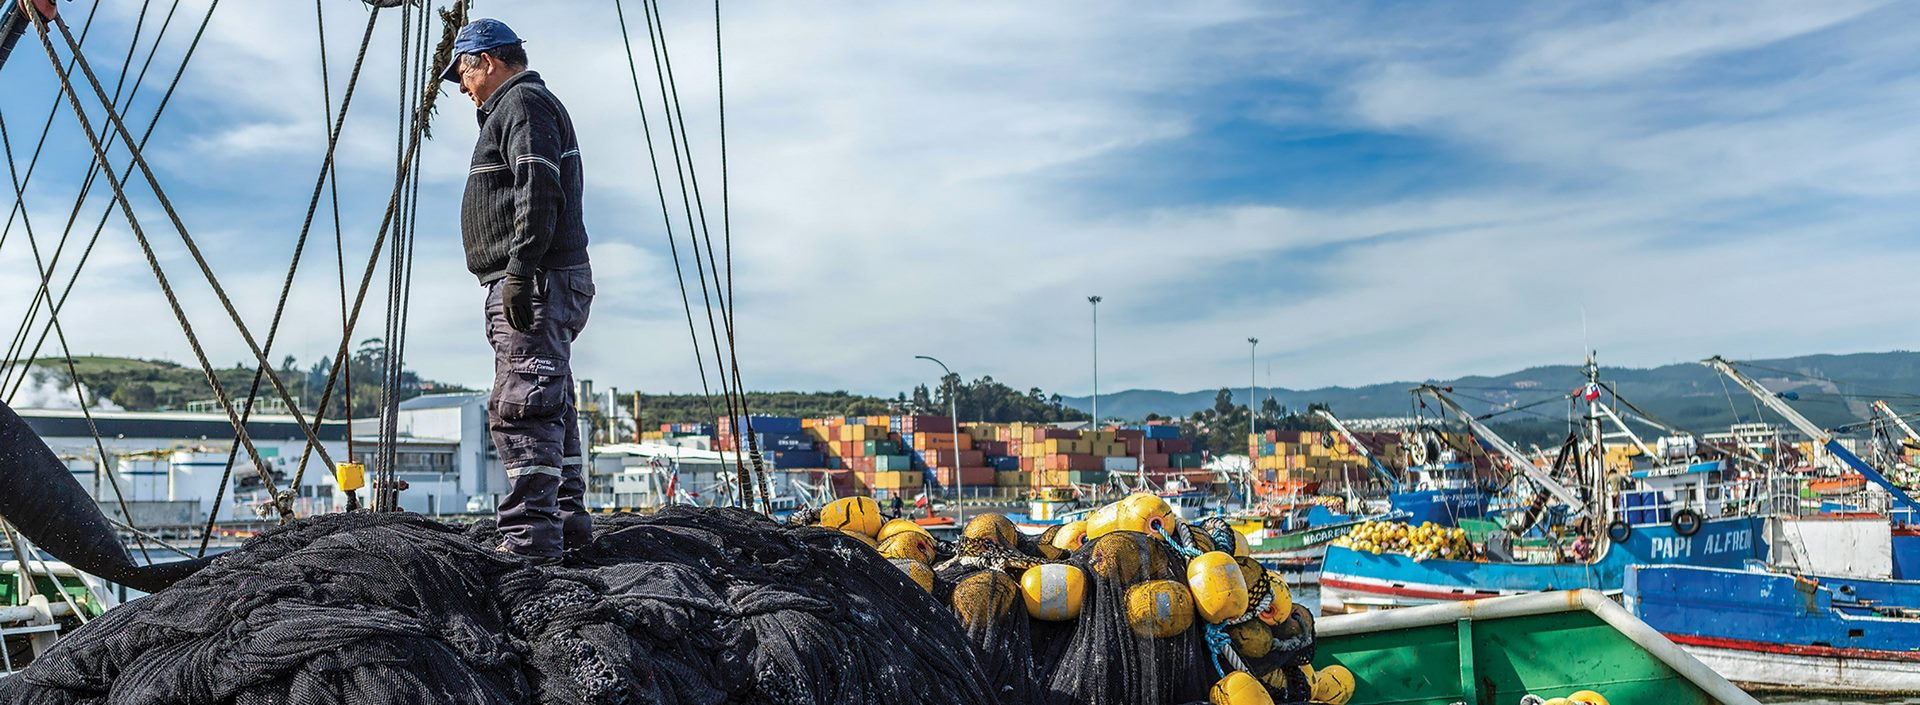 Recykling sieci rybackich Patagonia